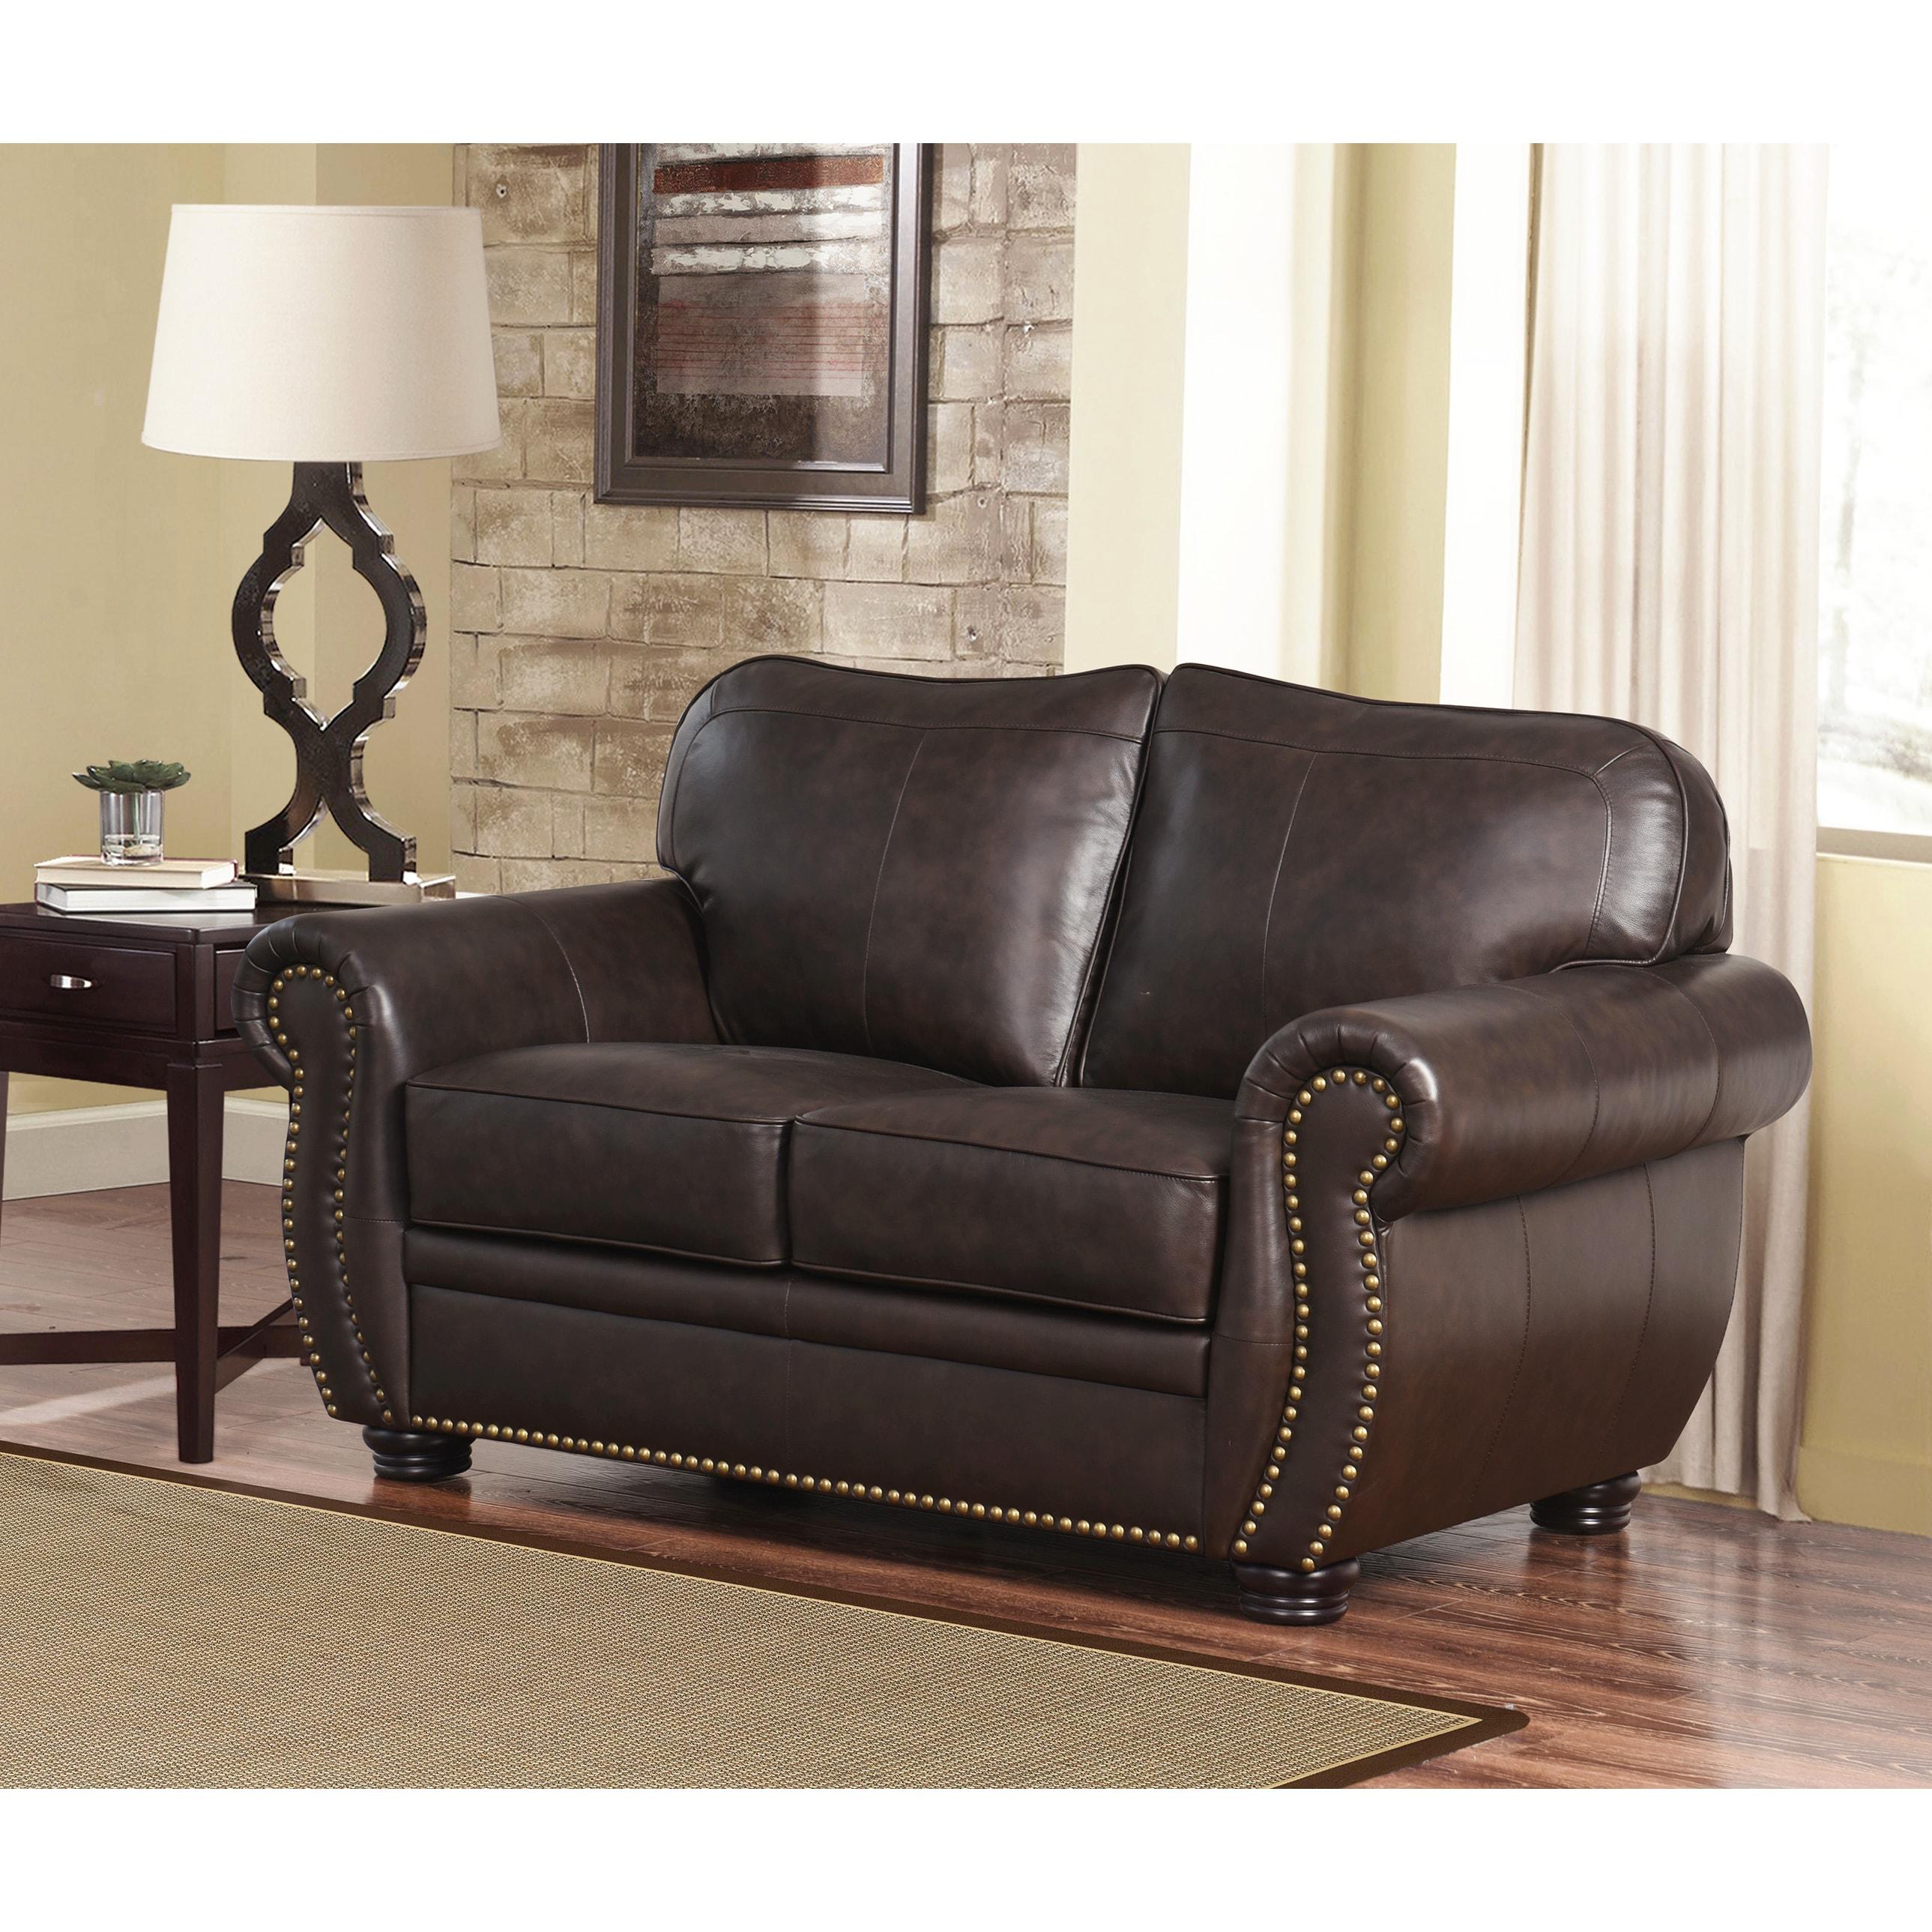 Abbyson Richfield Top-grain Leather Living Room Sofa Set - Free ...